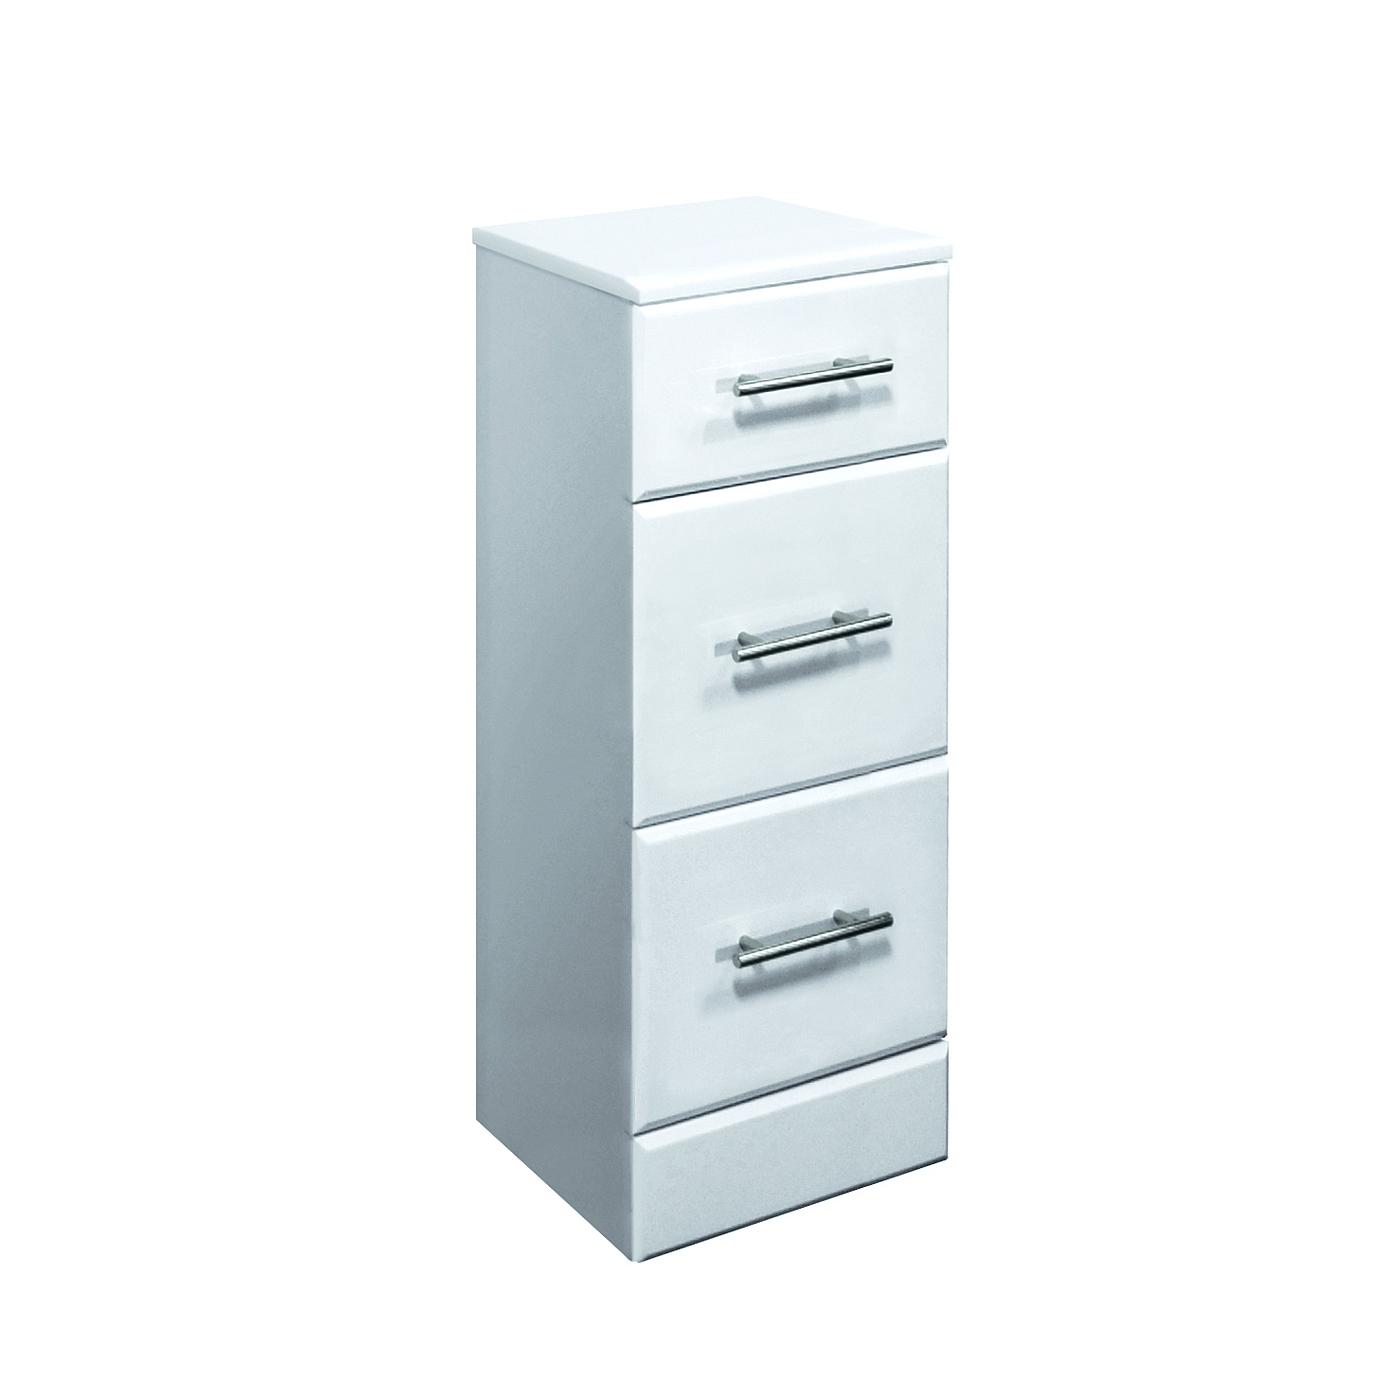 Premier 350x300mm Classic 3 Drawer Unit Gloss White